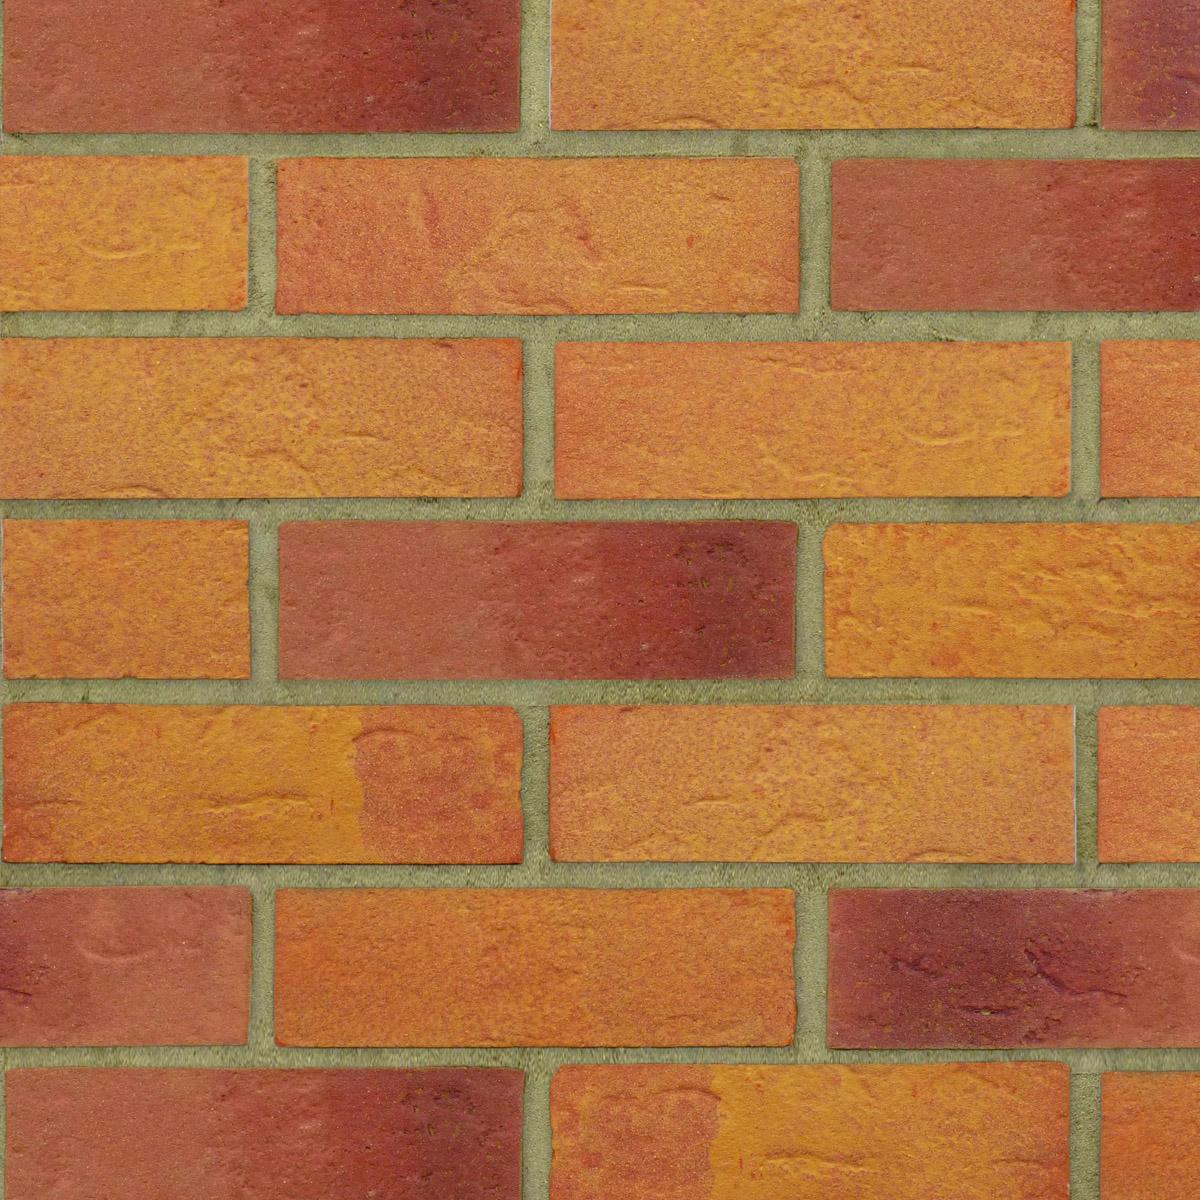 Kentmere Light Multi Bricks - Neutral